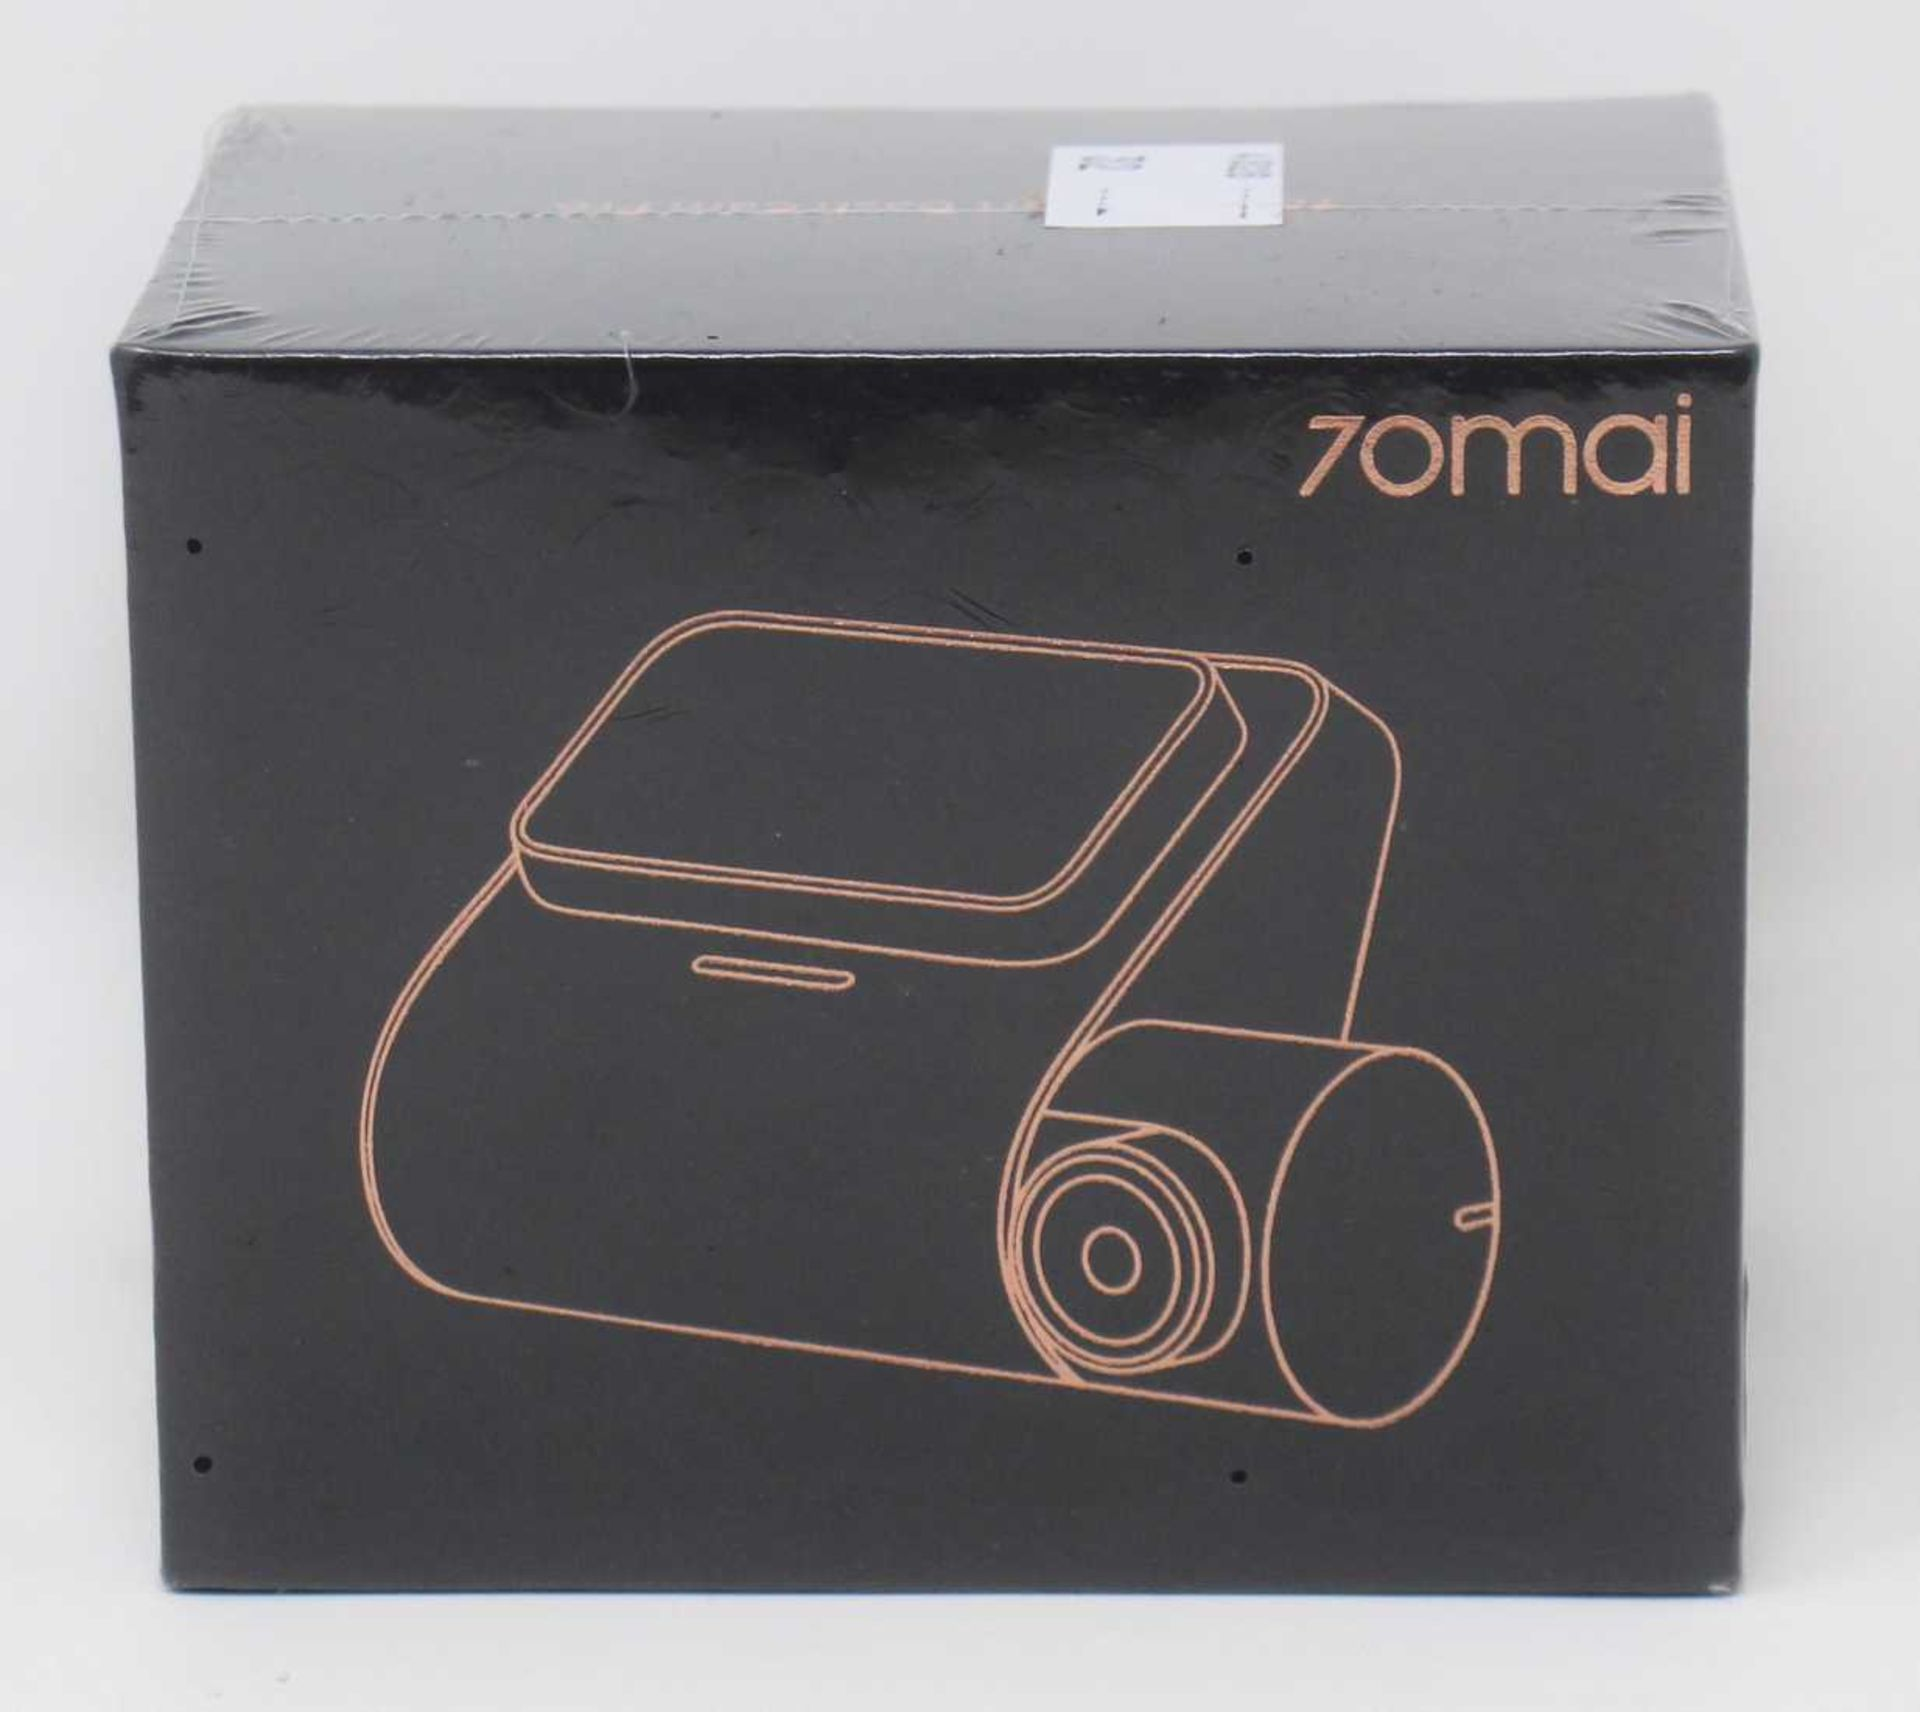 A boxed as new 70mai Smart Dash Cam Pro.